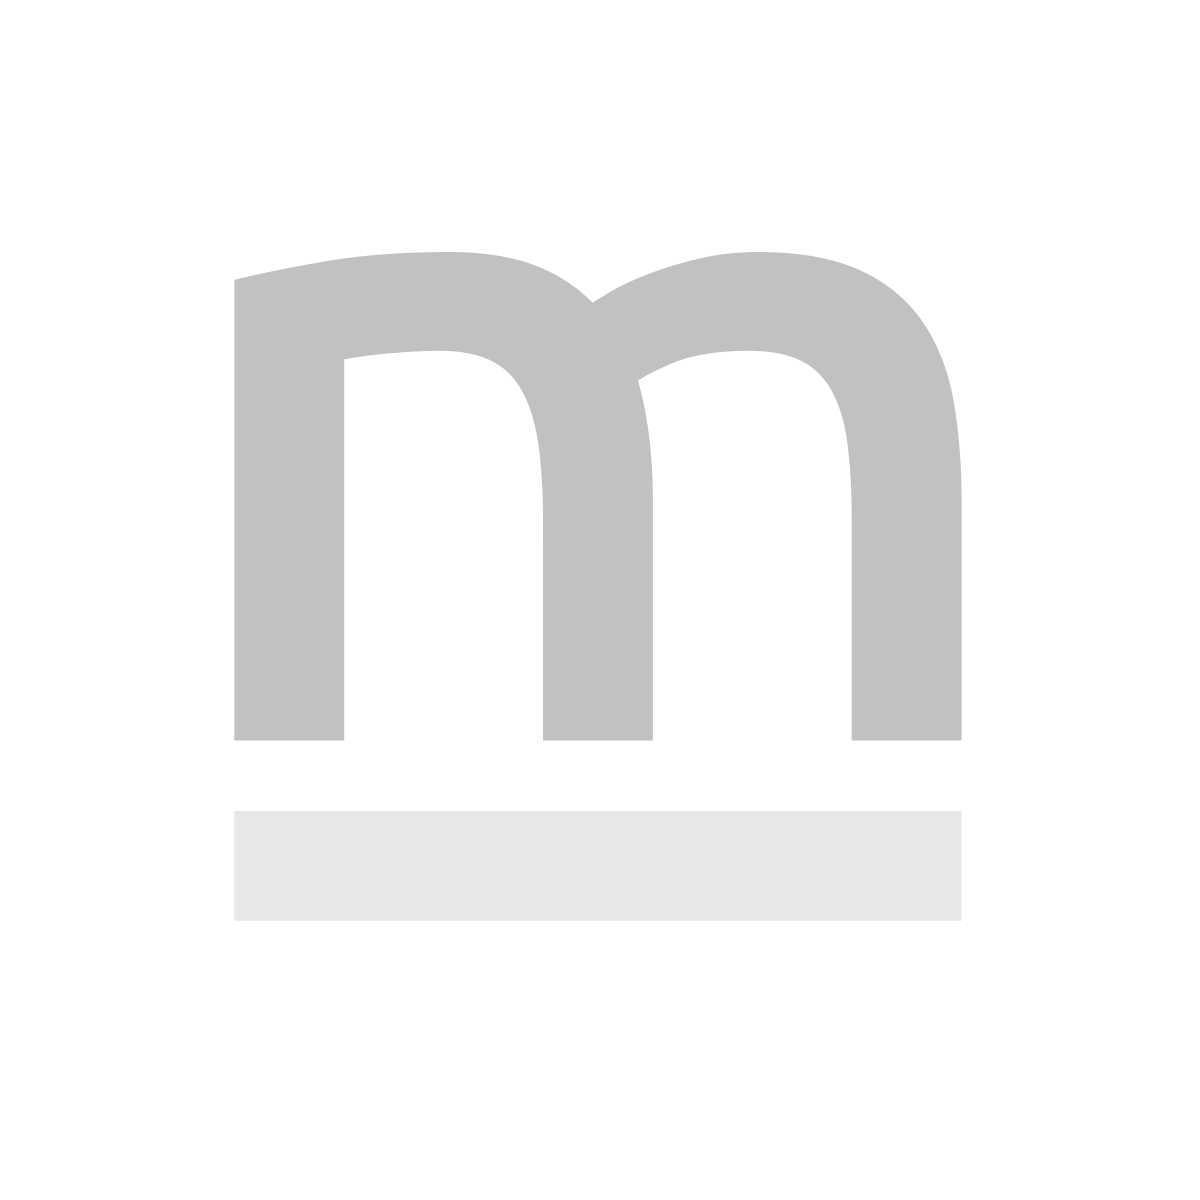 Krzesło CYPRIAN VELVET morskie